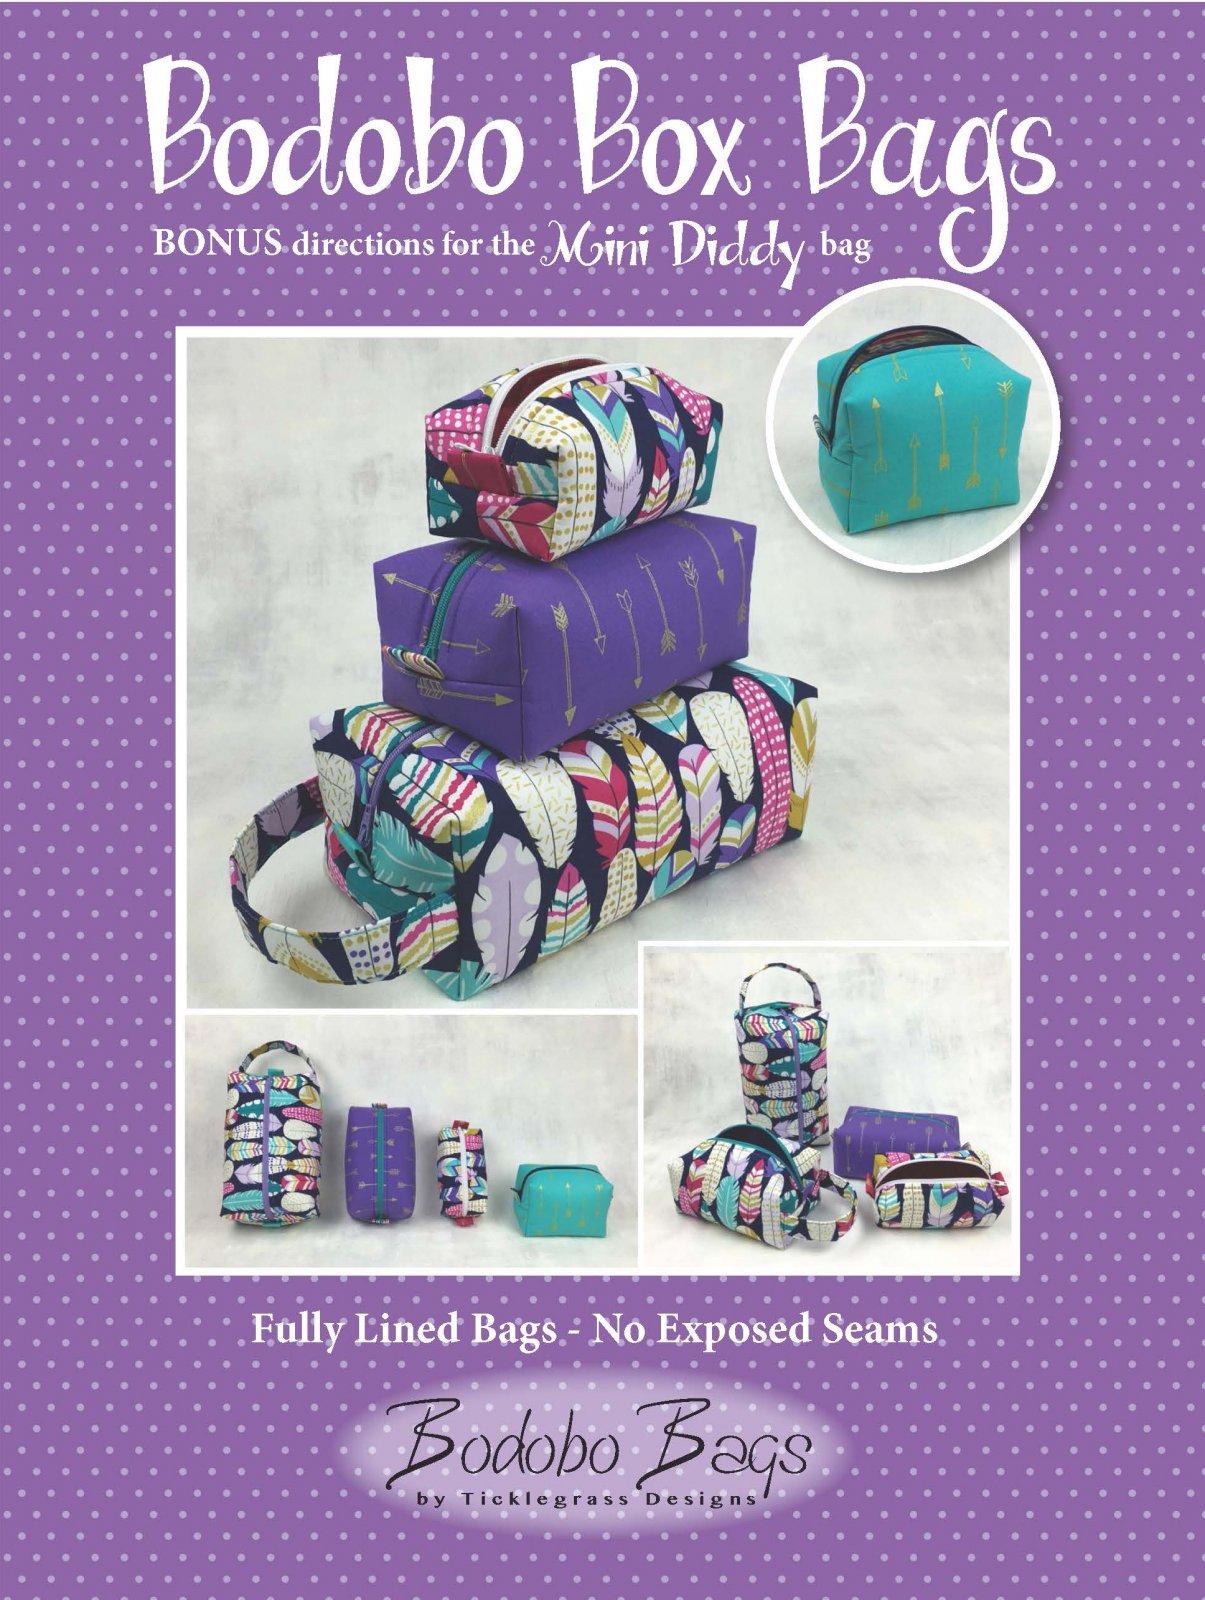 Bodobo Box Bags